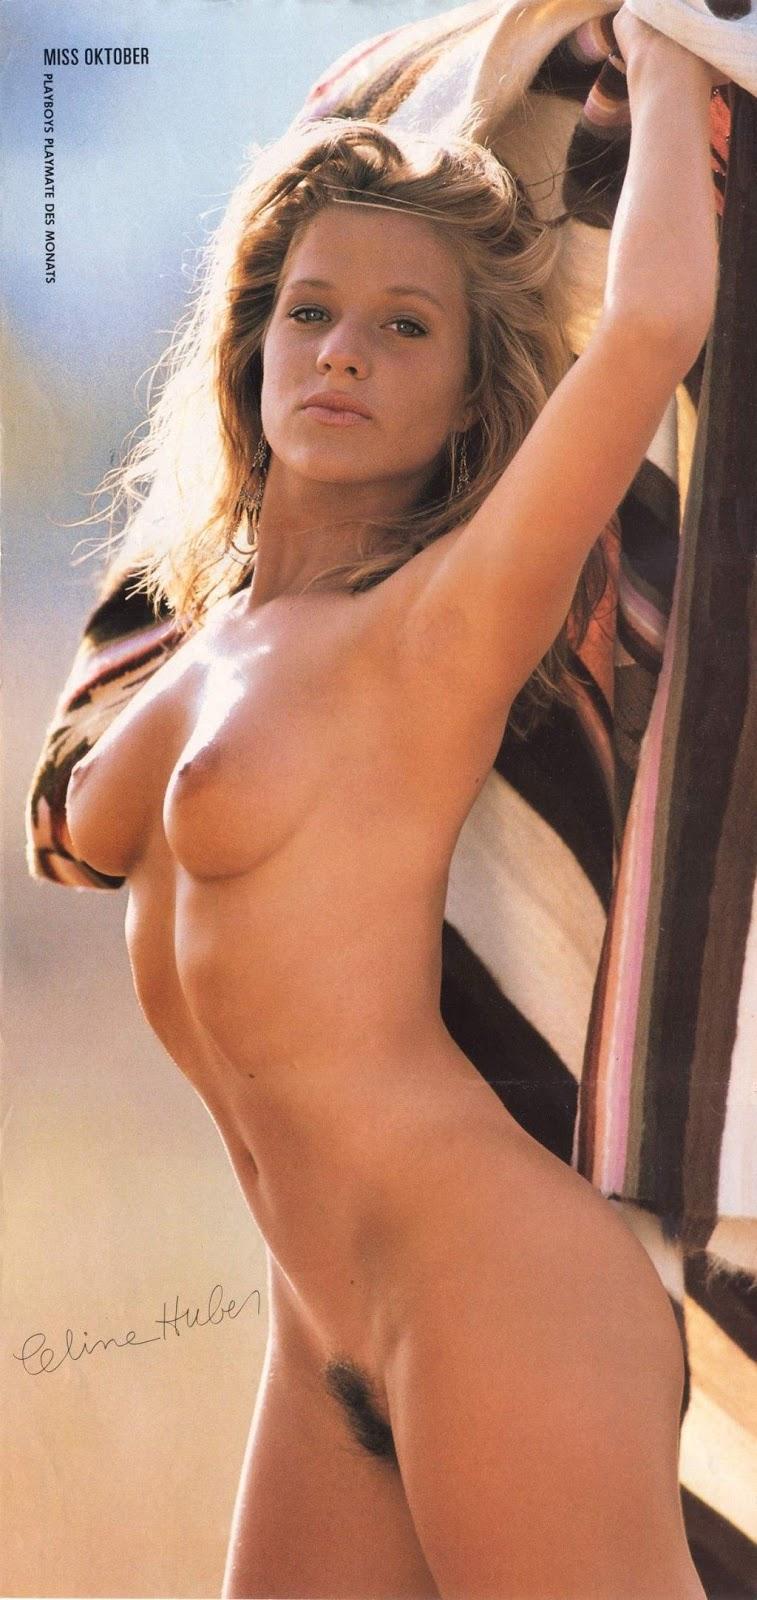 Susanne montag nackt